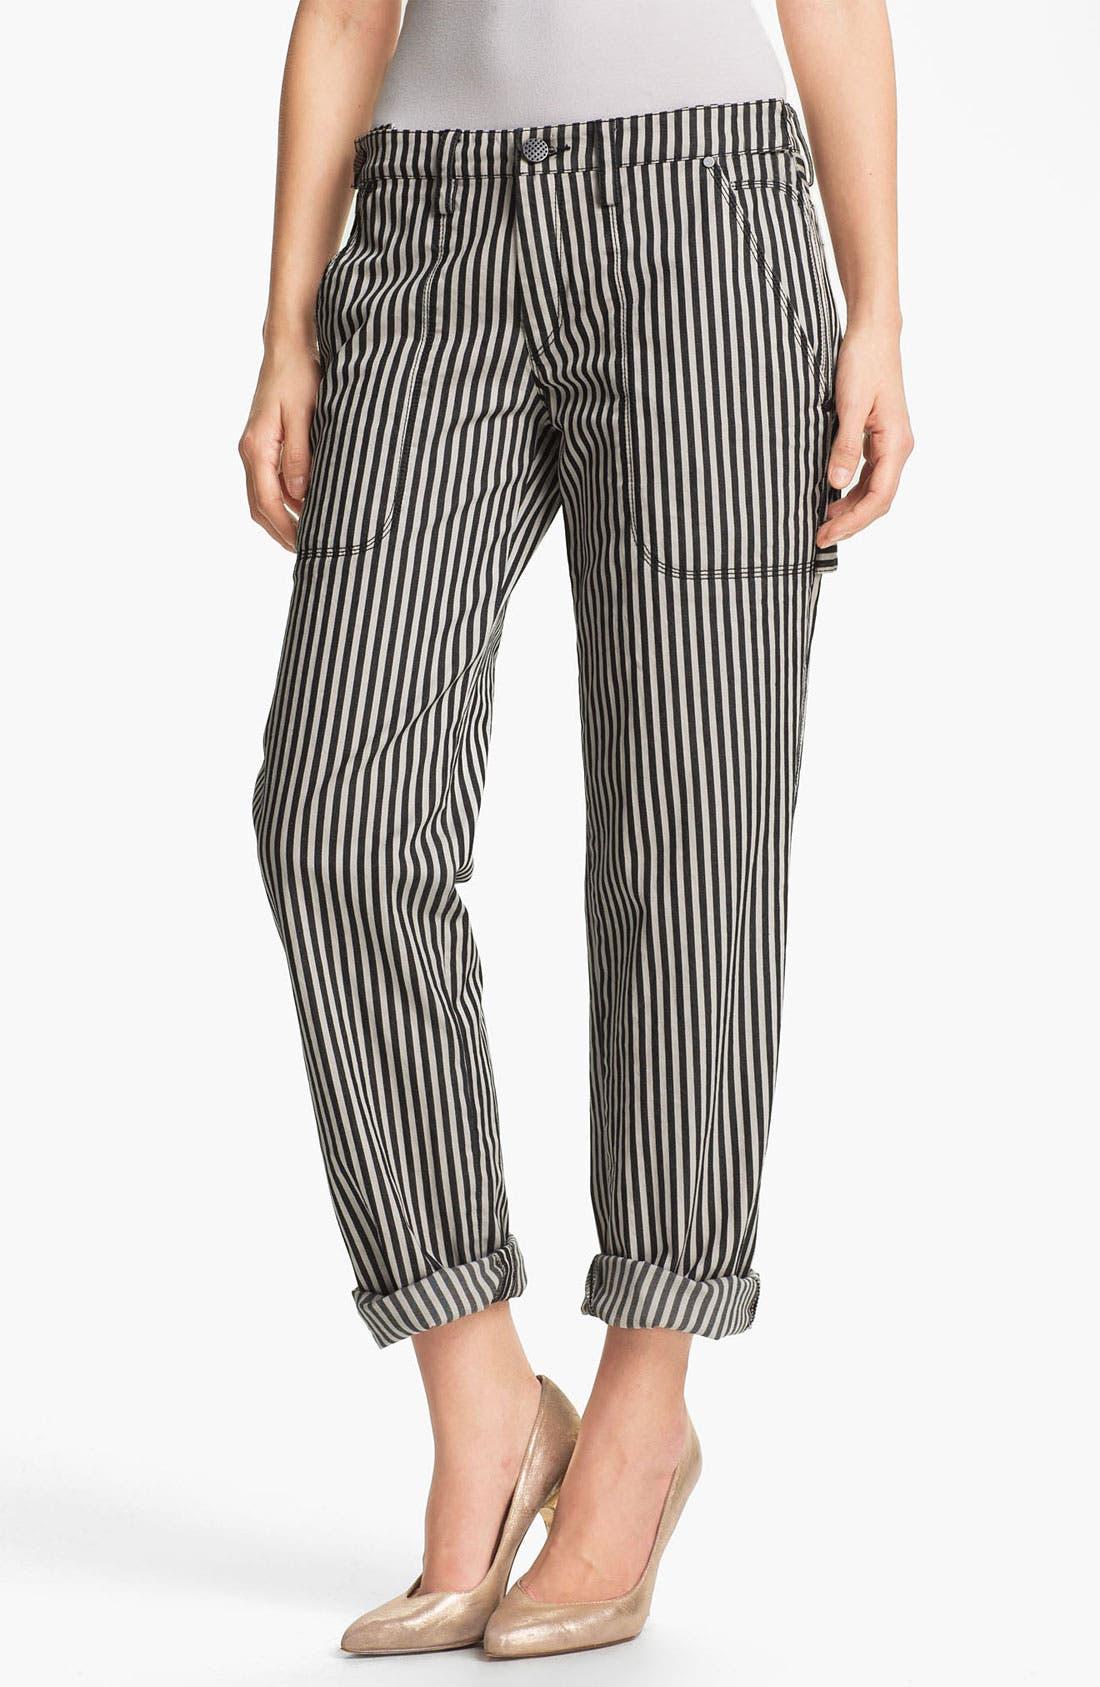 Alternate Image 1 Selected - Kelly Wearstler 'Practitioner' Stripe Pants